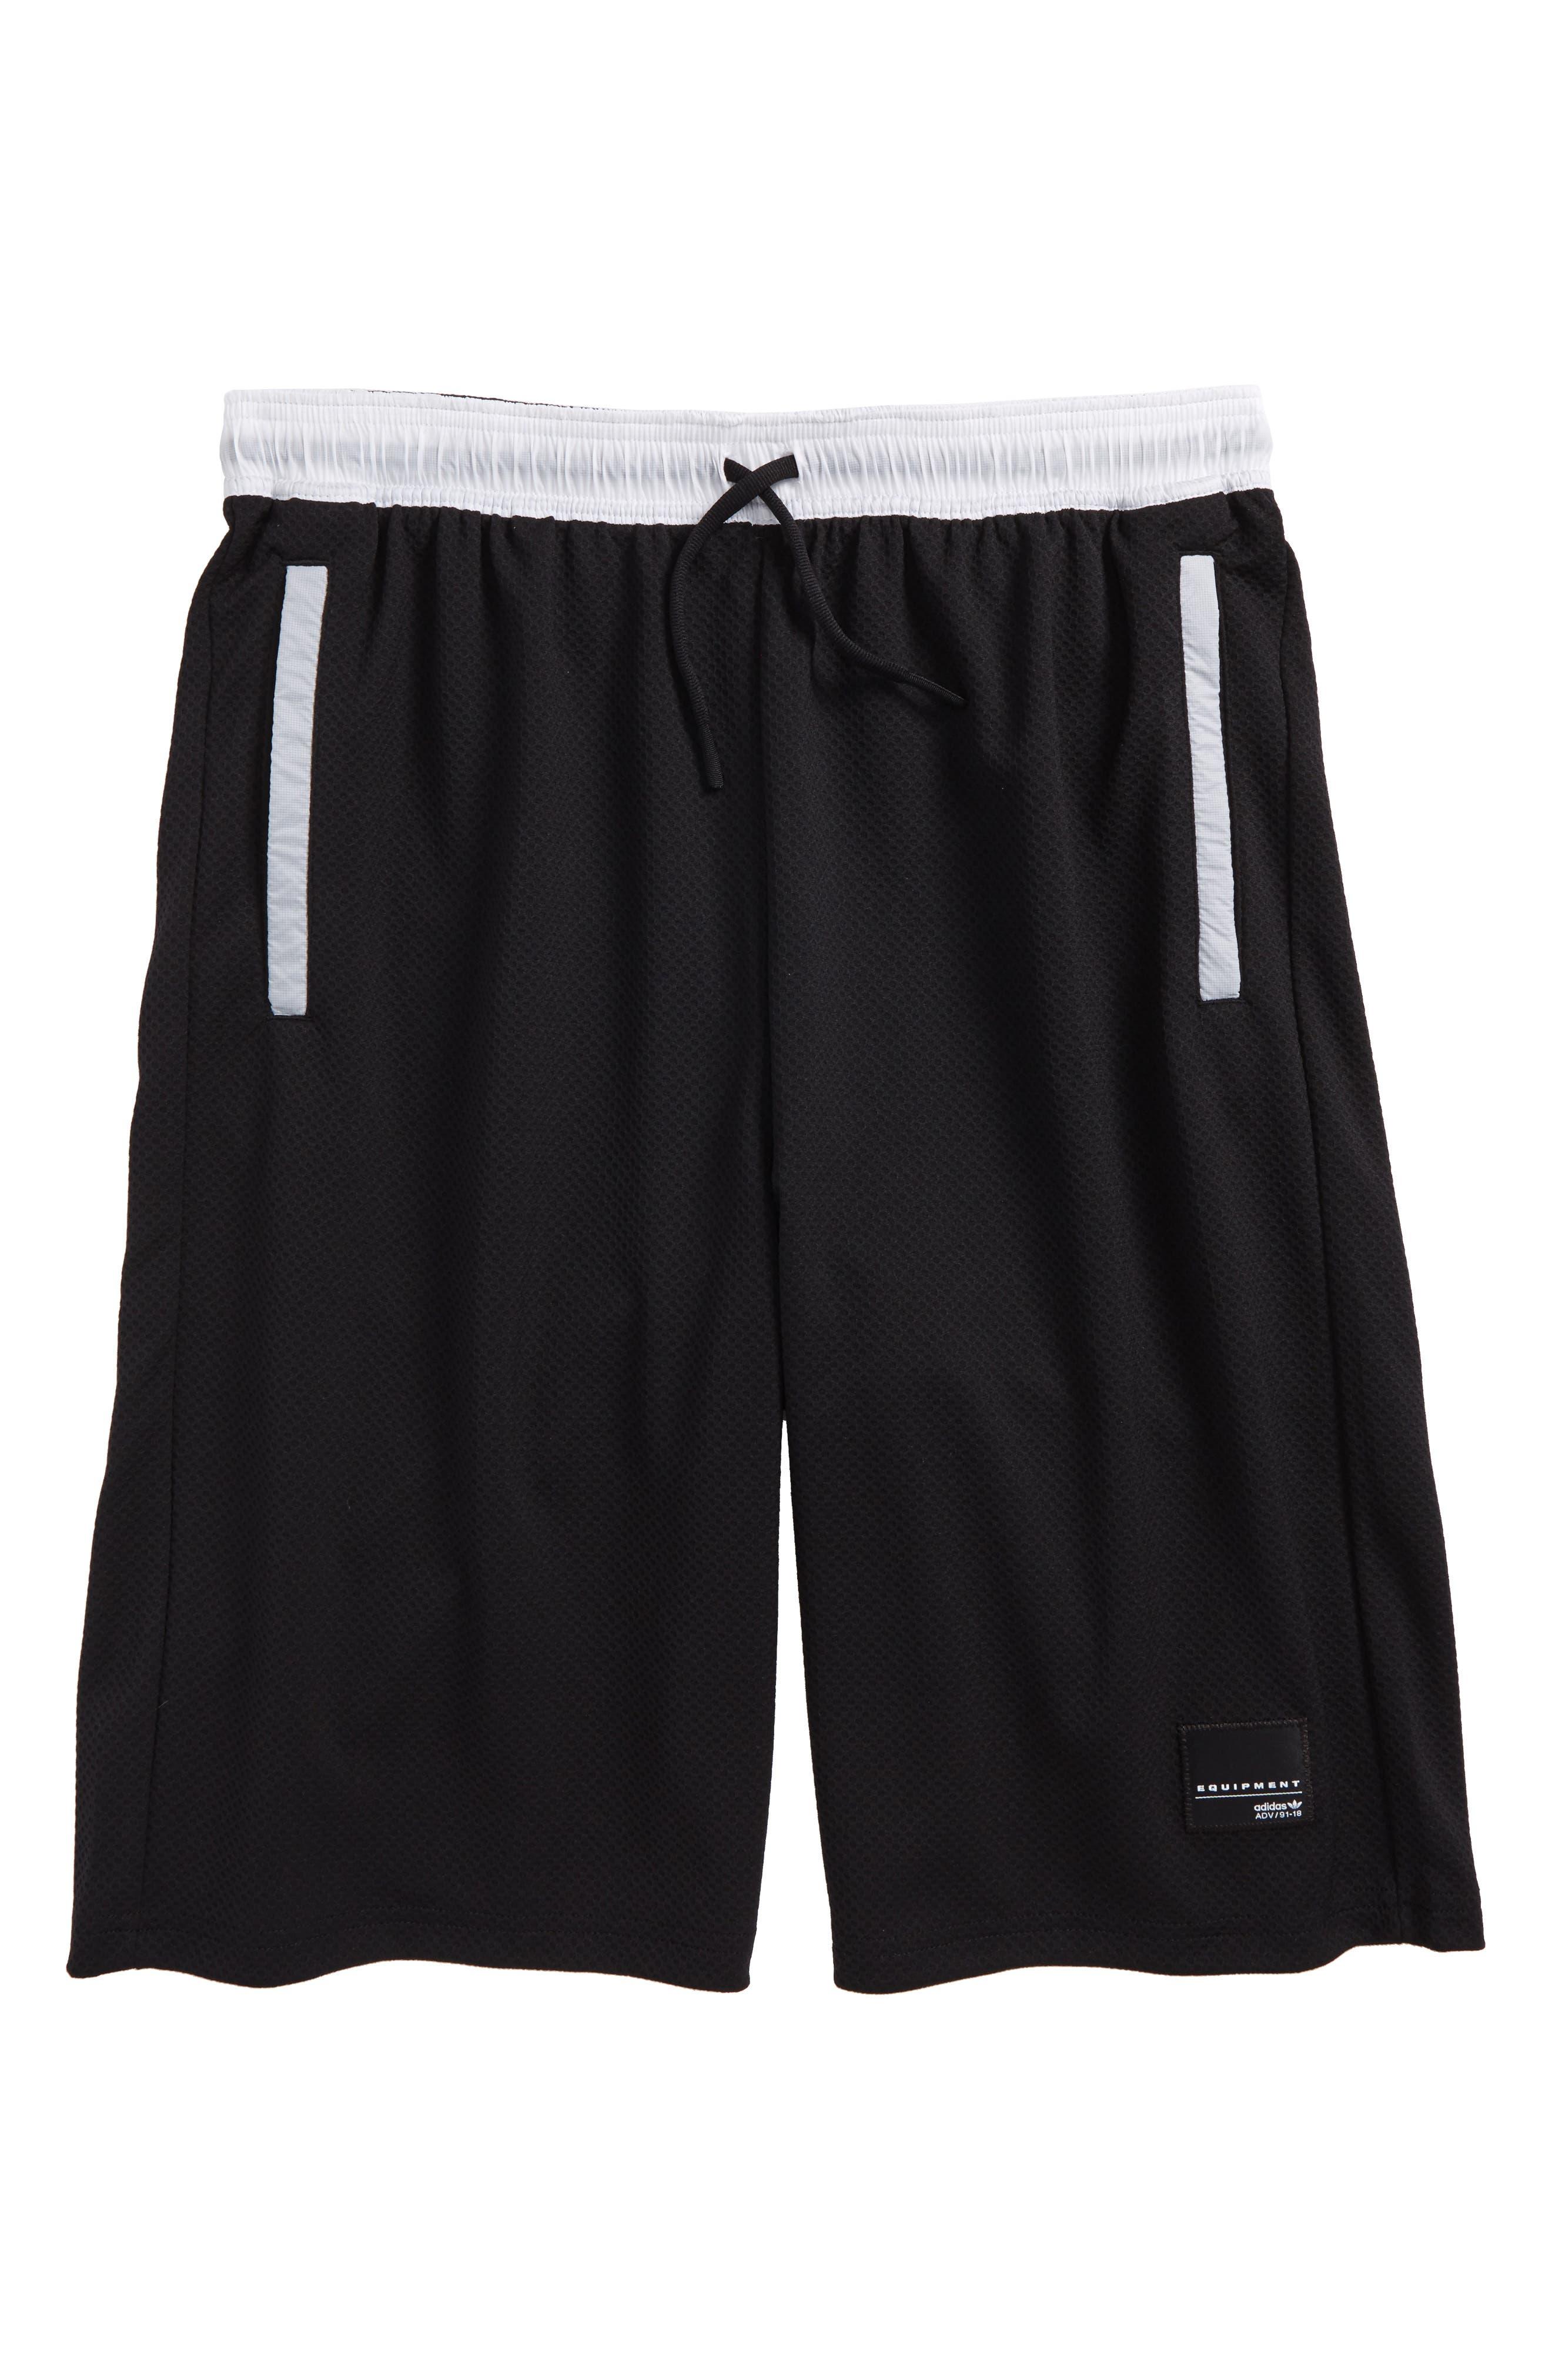 EQT Shorts,                             Main thumbnail 1, color,                             001